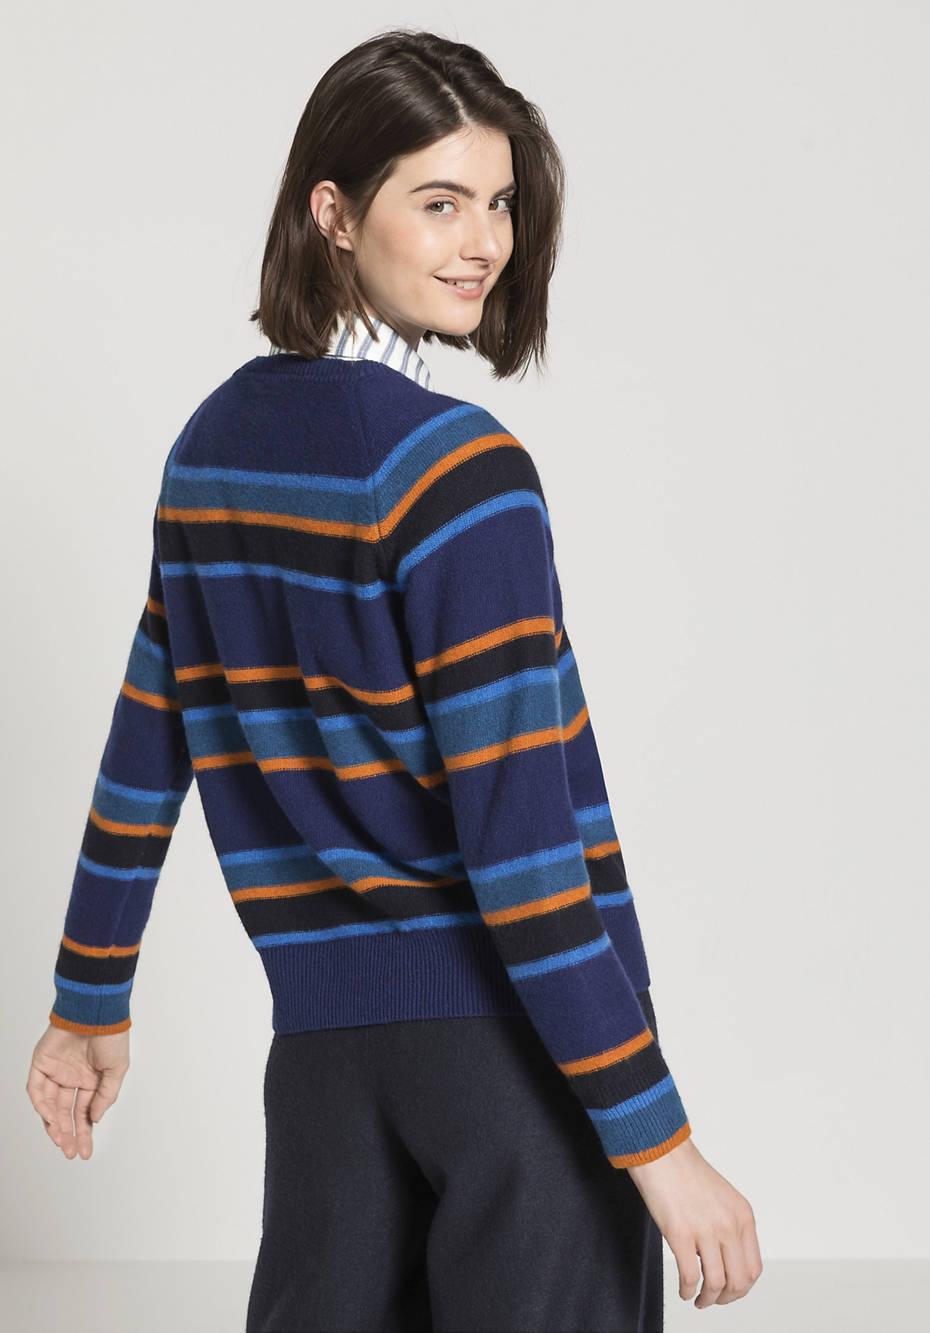 Raglan-Pullover aus reiner Lambswool